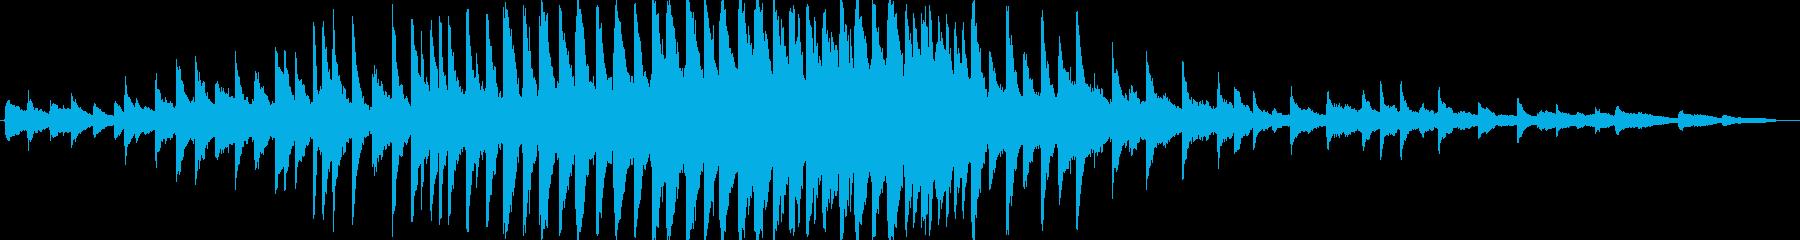 Pianoforte Solo。ロ...の再生済みの波形